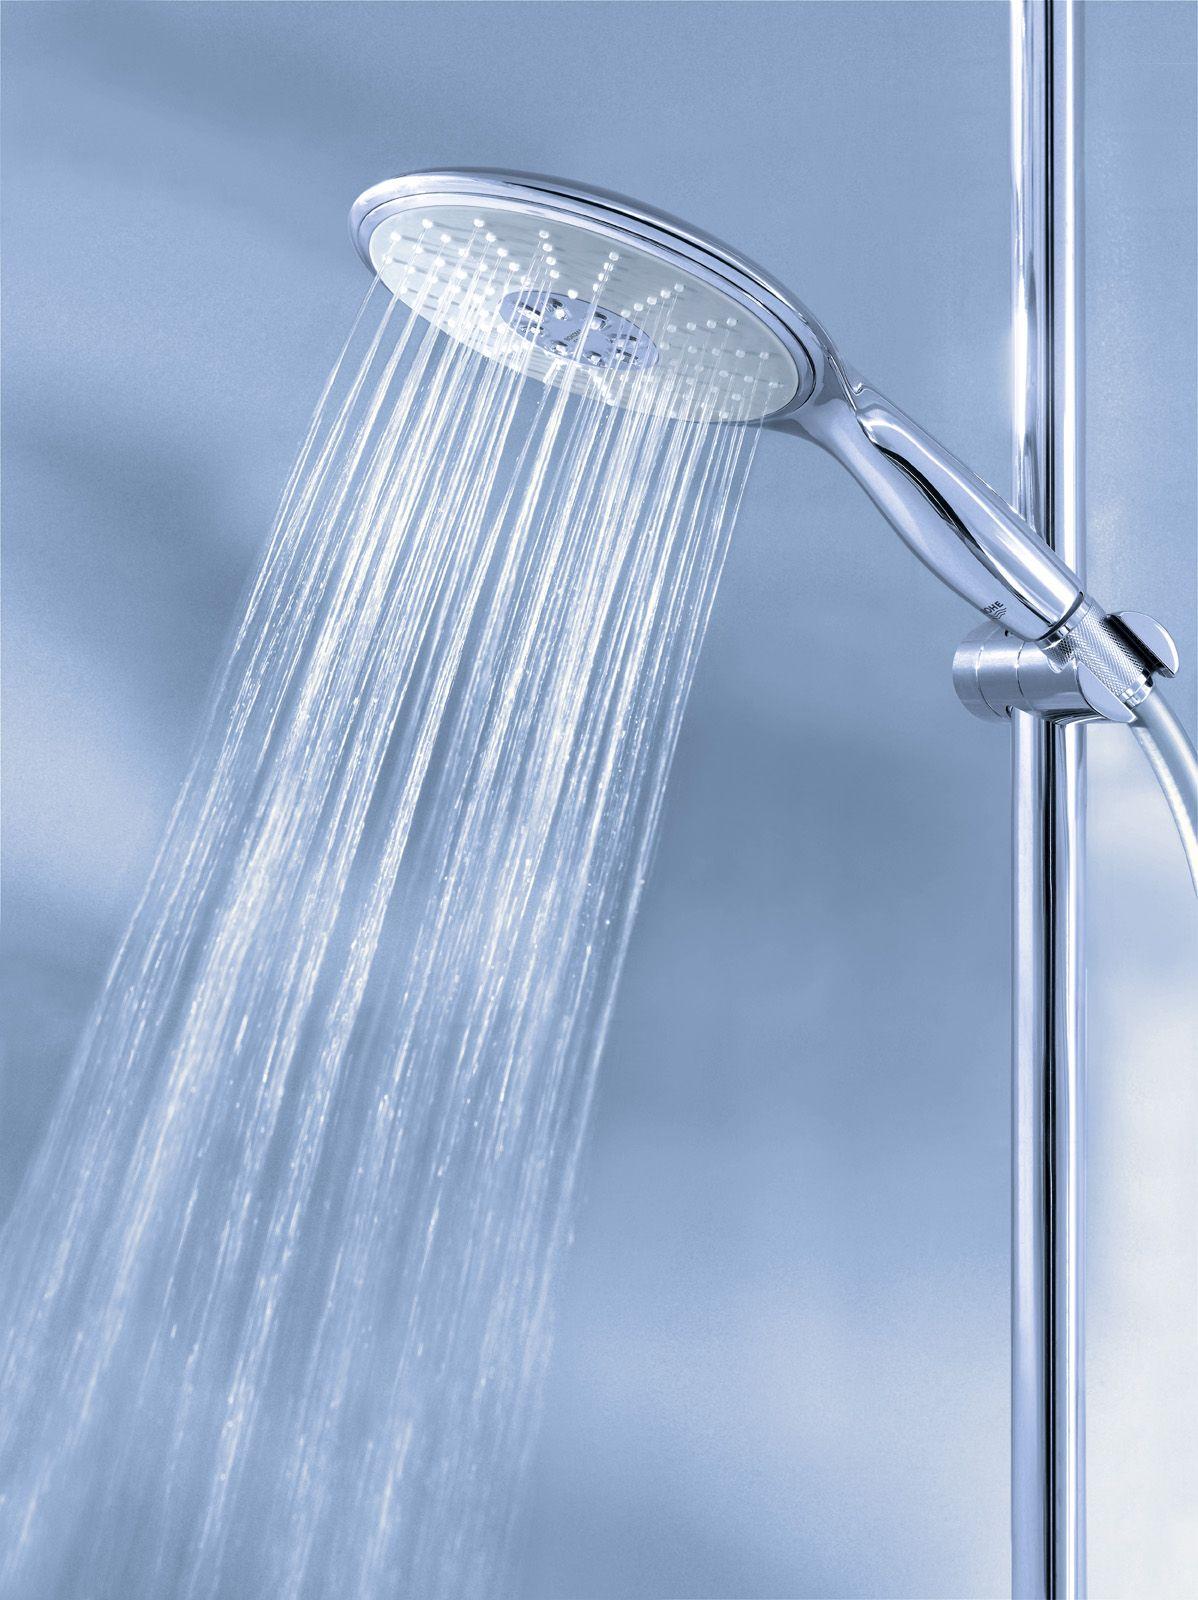 GROHE Power & Soul Hand Shower. #bathroom #shower #hand #power See ... - GROHE Power & Soul Hand Shower. #bathroom #shower #hand #power See